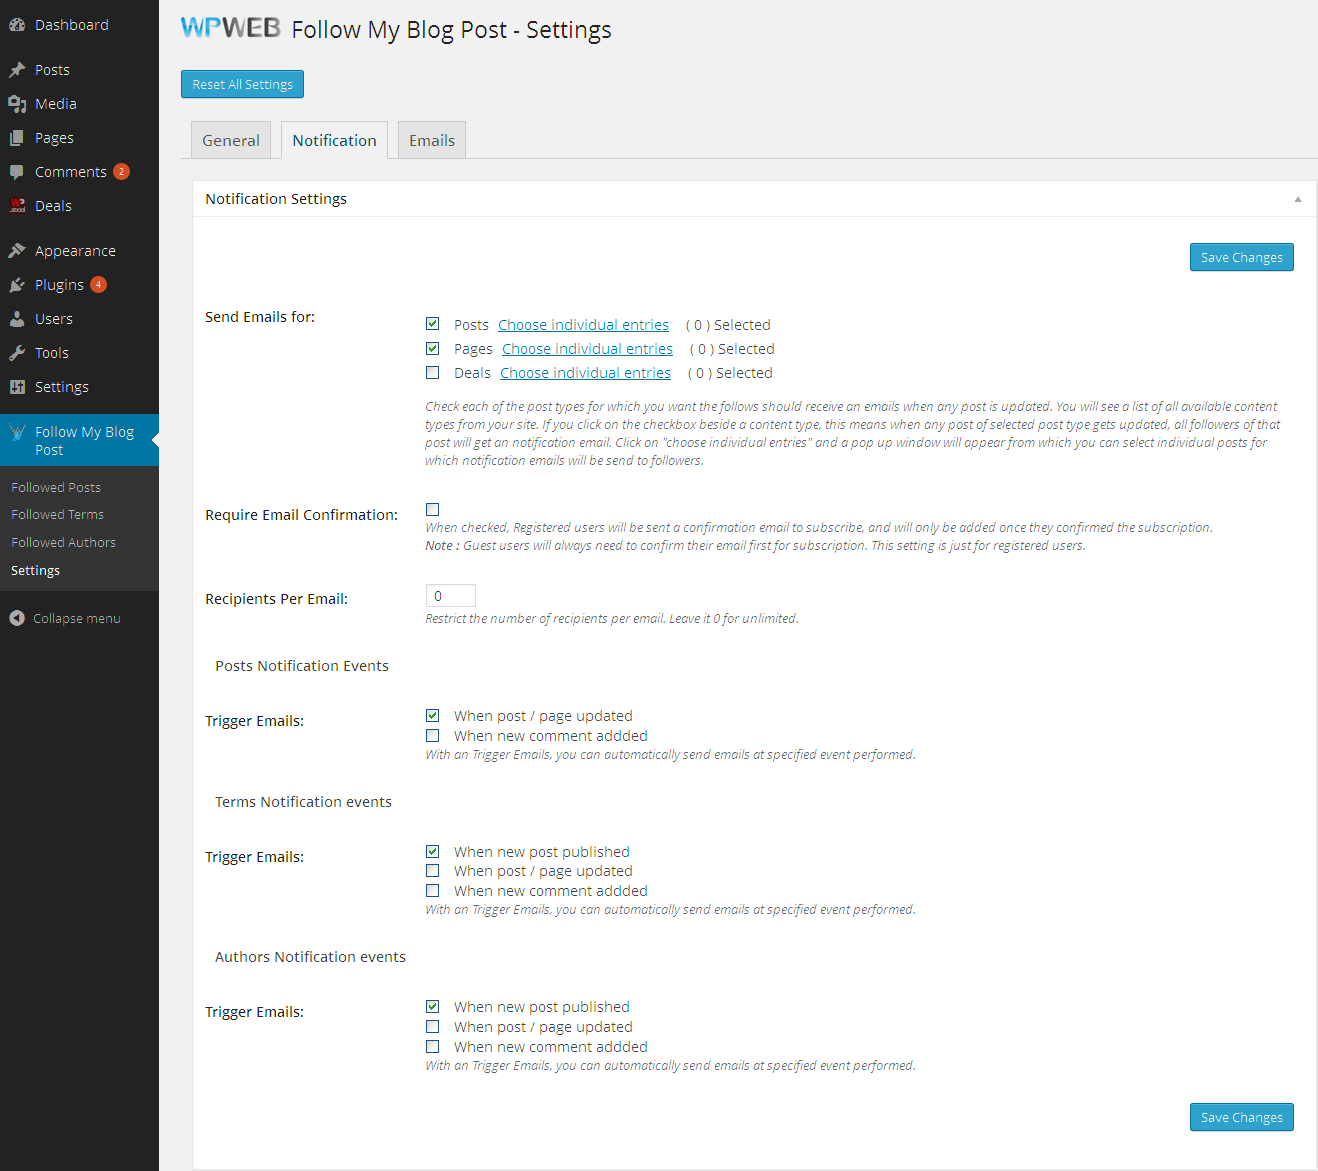 04f722d5d8 Follow My Blog Post - WordPress Plugin - CodeCanyon Item for Sale.  Screenshots 1.png Screenshots 10.png Screenshots 11.png Screenshots 12.png  ...